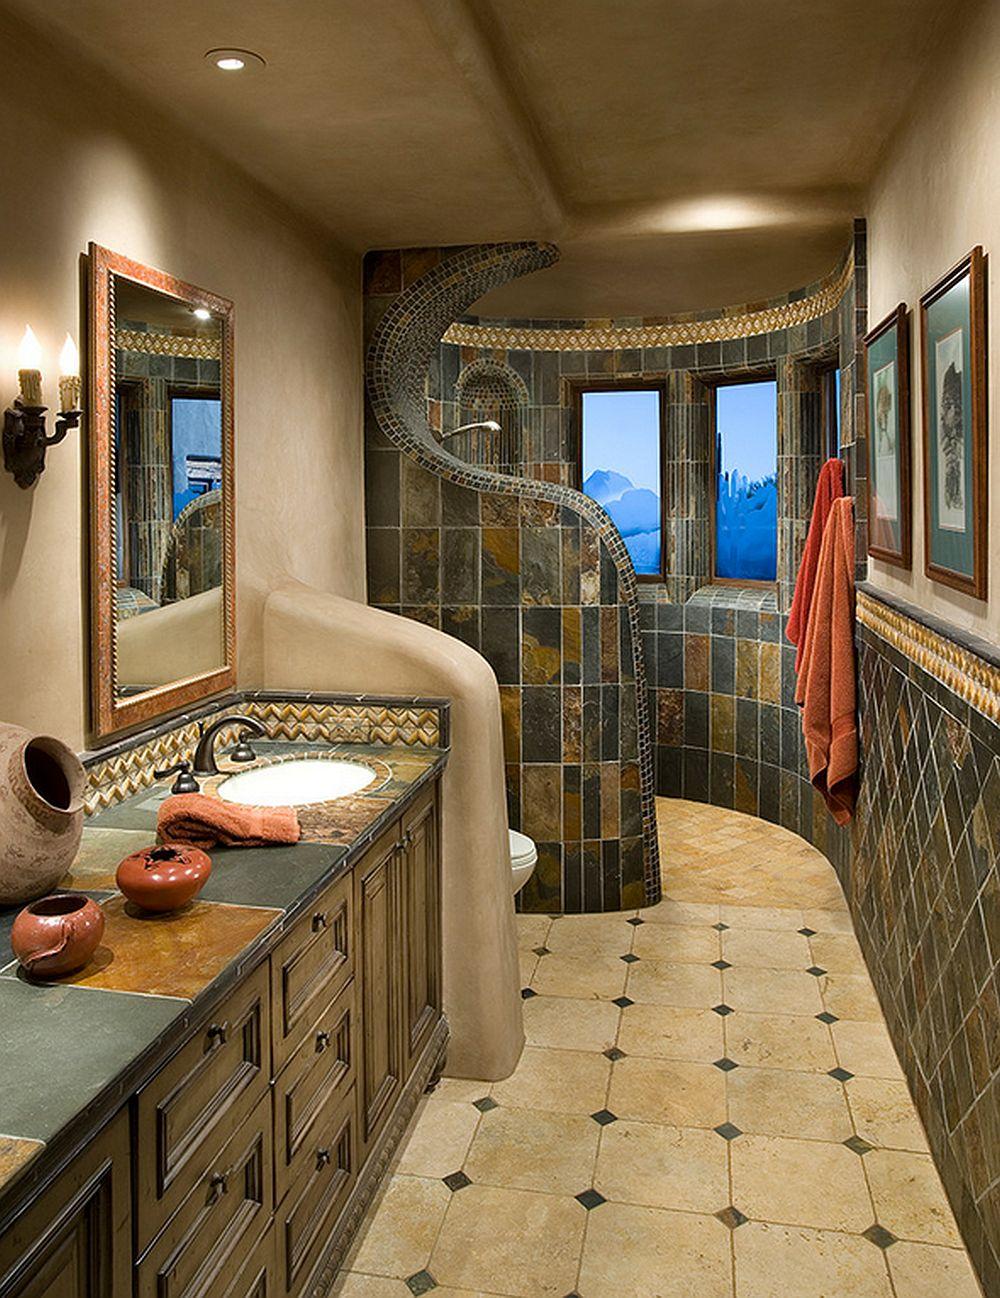 adelaparvu.com despre casa pe rotund cu piscina, casa de lut si lemn, casa americana, arhitect Lee Hutchison UDA, interior design Bess Jones, Foto Dino Tonn (7)